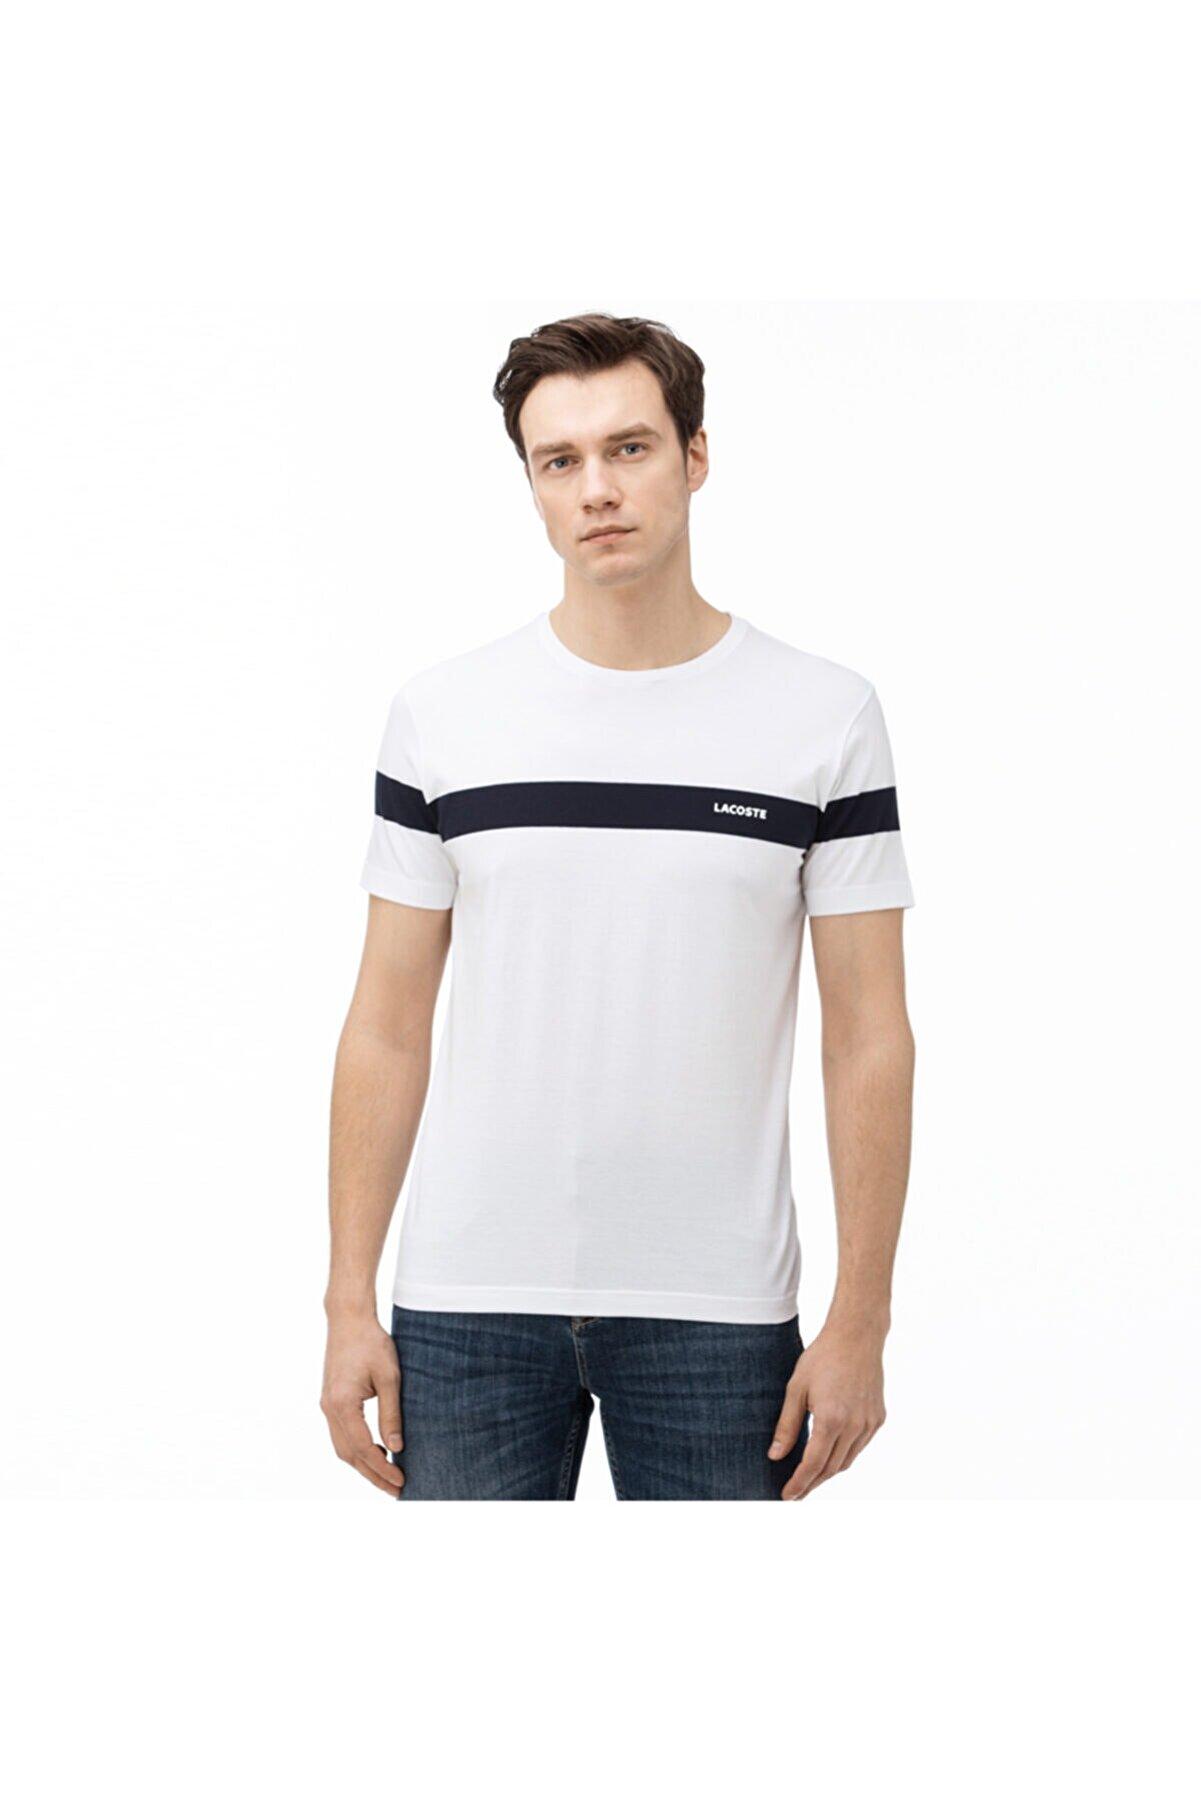 Lacoste Erkek Bisiklet Yaka Çizgili Beyaz T-Shirt TH0054